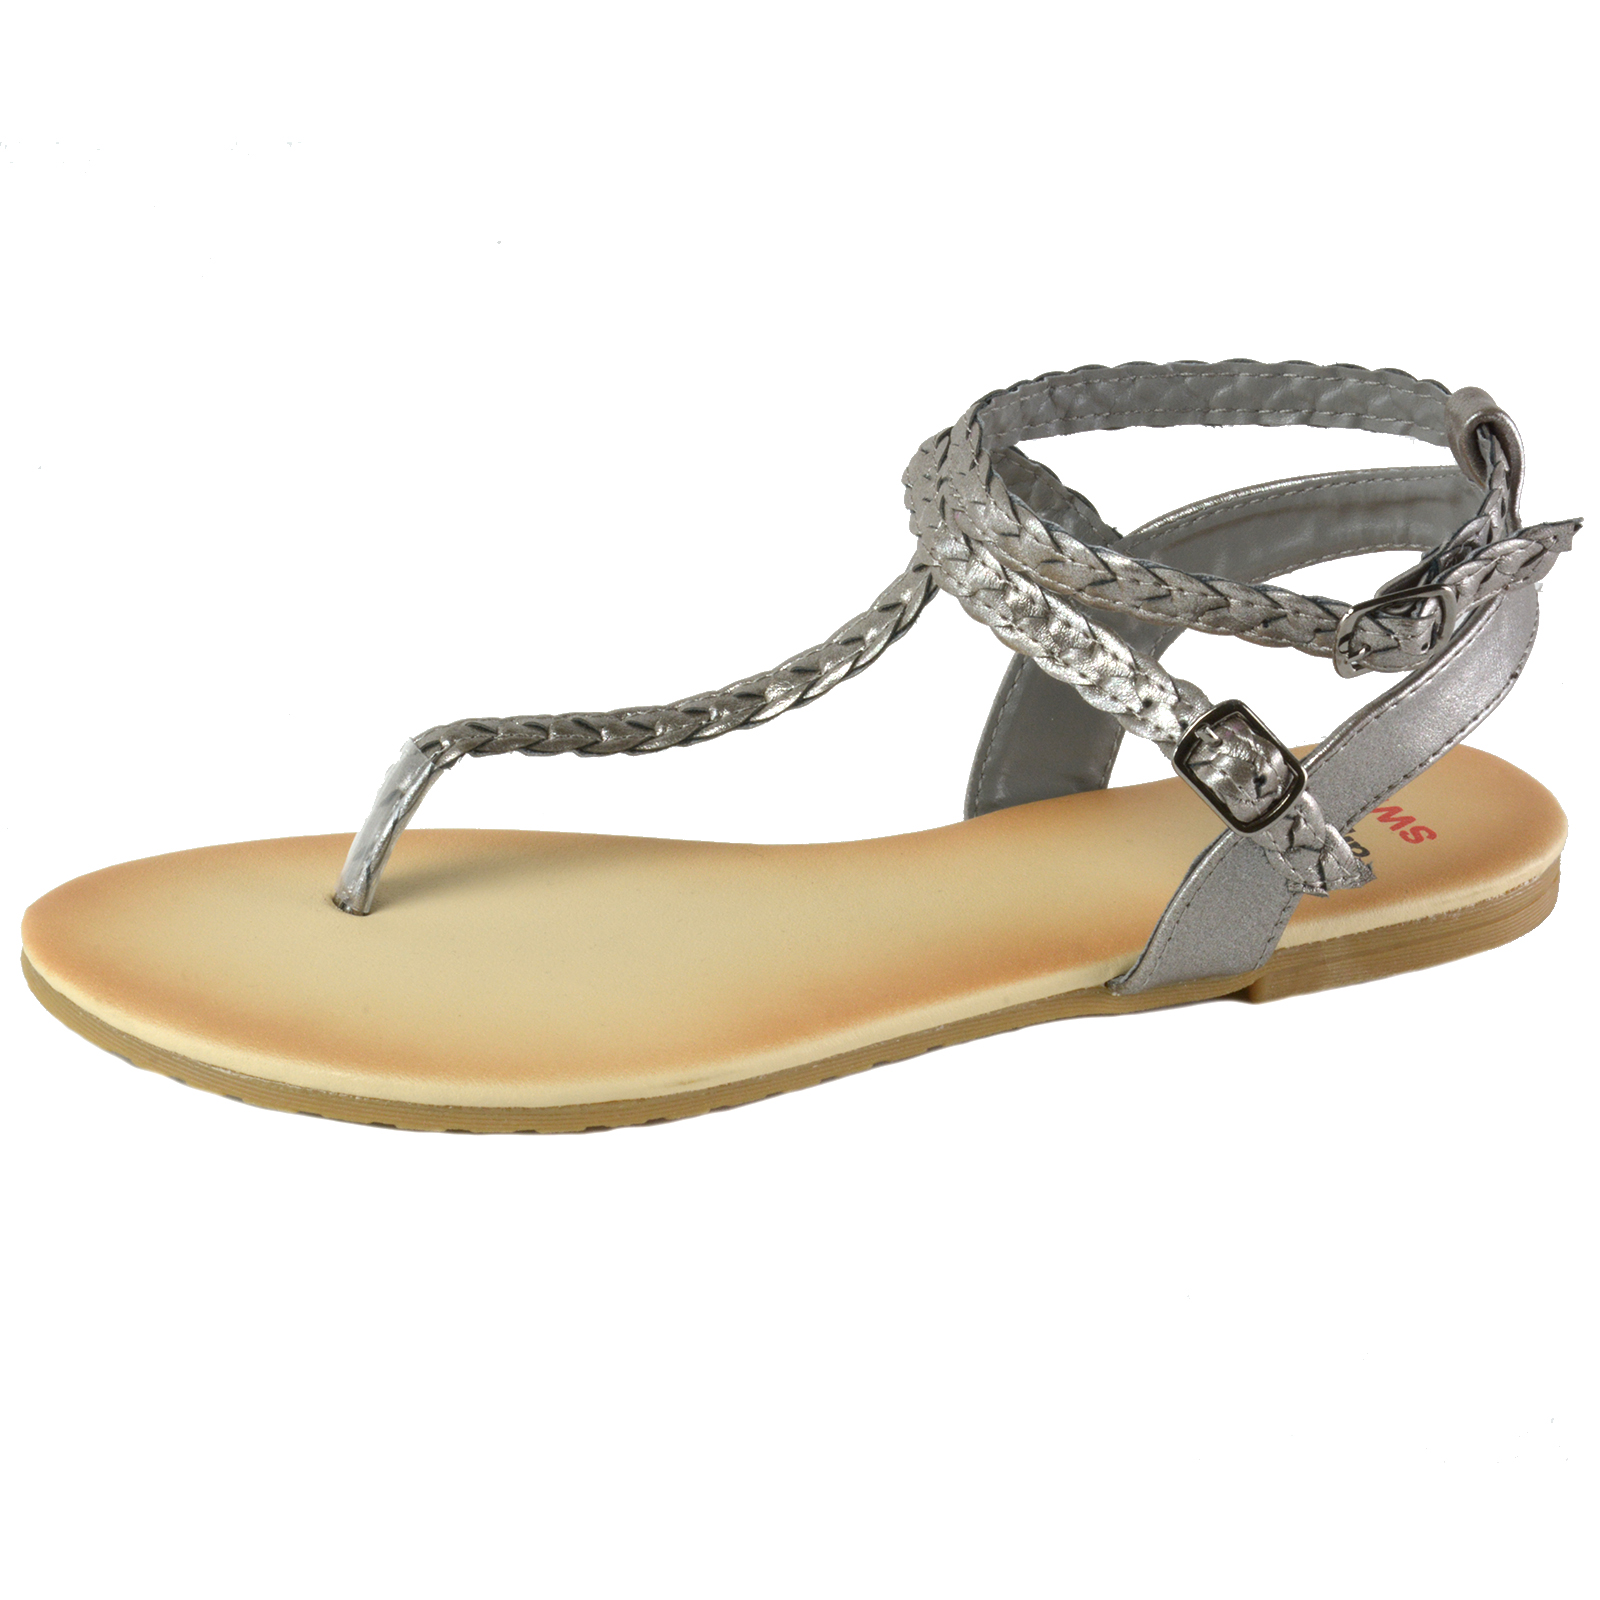 9ac220fbc433f0 Alpine Swiss Womens Gladiator Sandals Braided T-Strap Slingback ...